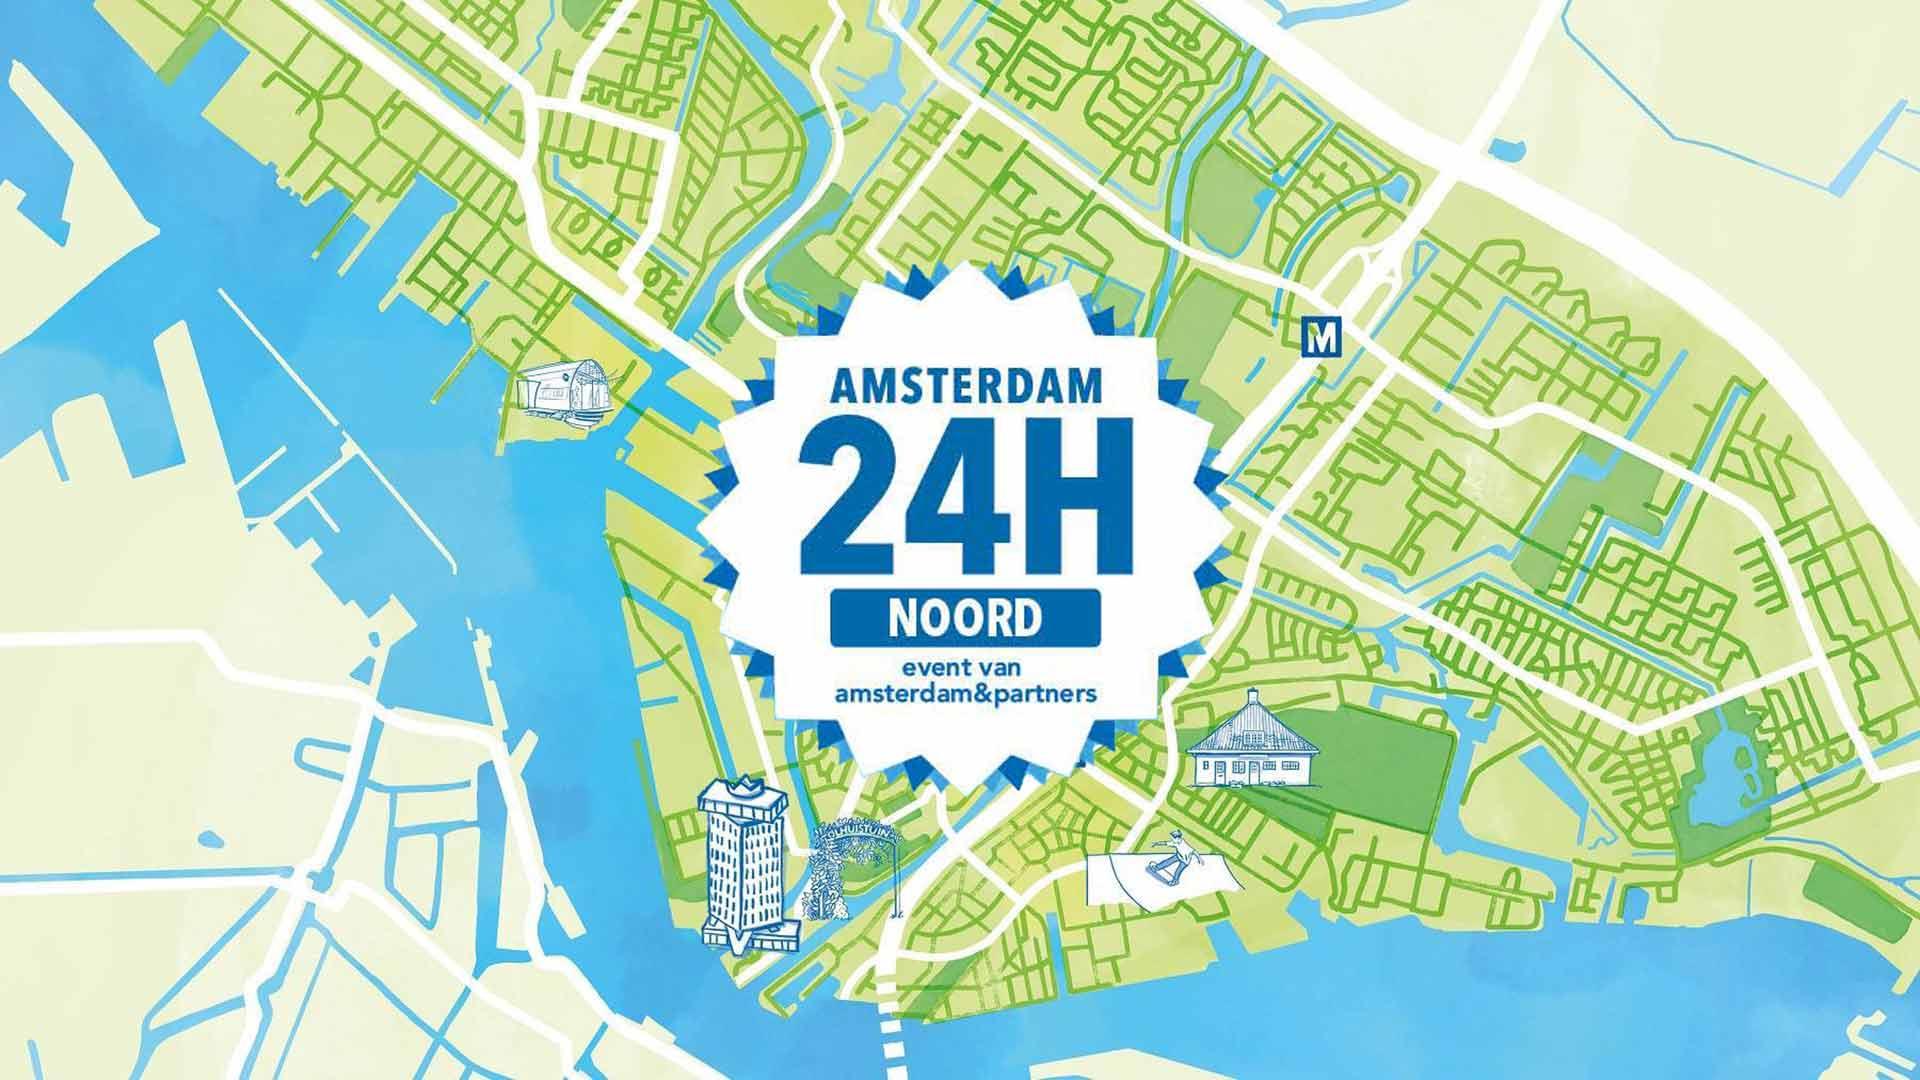 Amsterdam 24H Noord